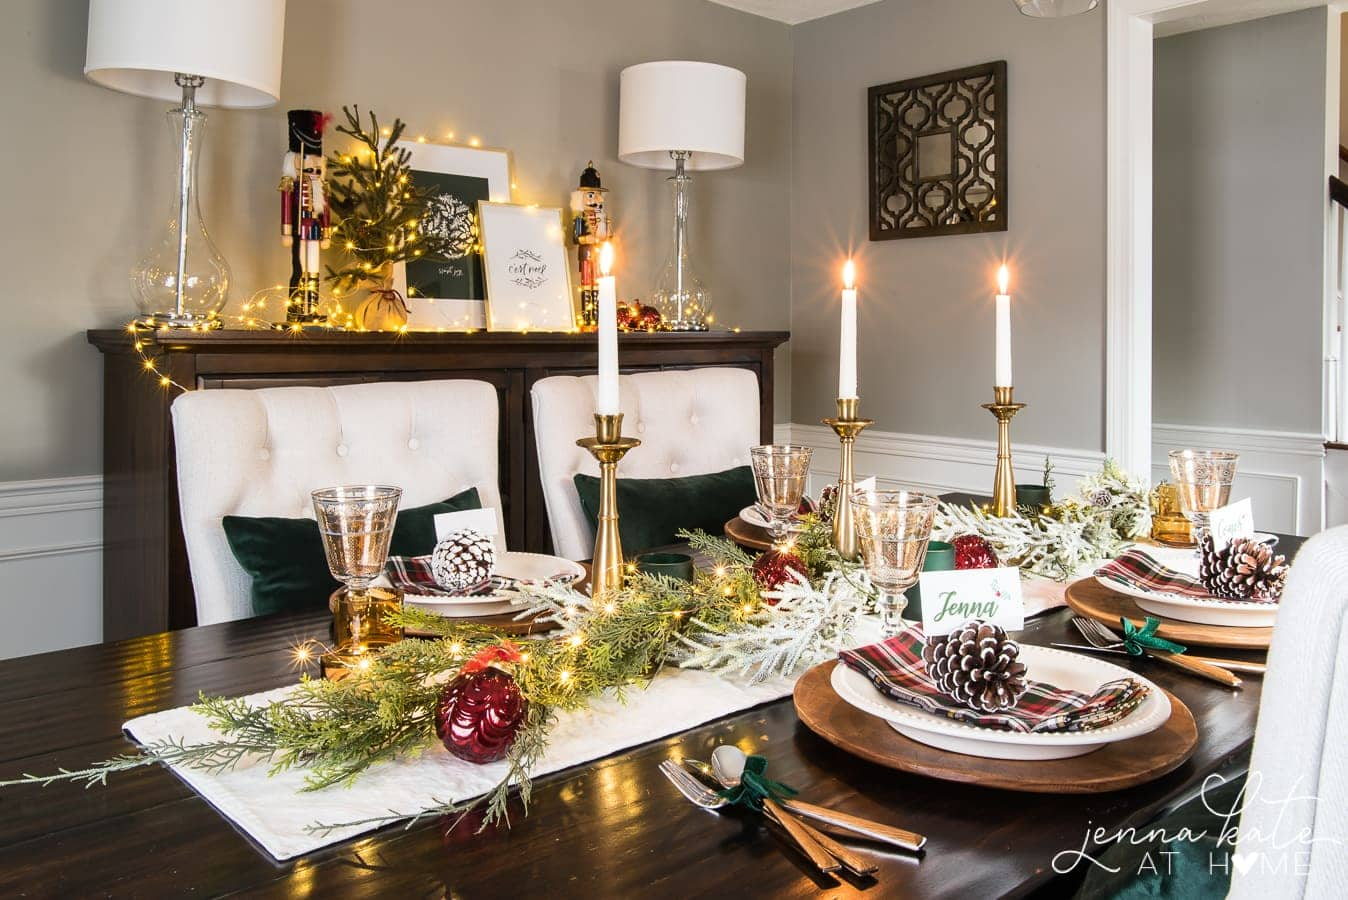 An elegant take on a traditional Christmas table setting